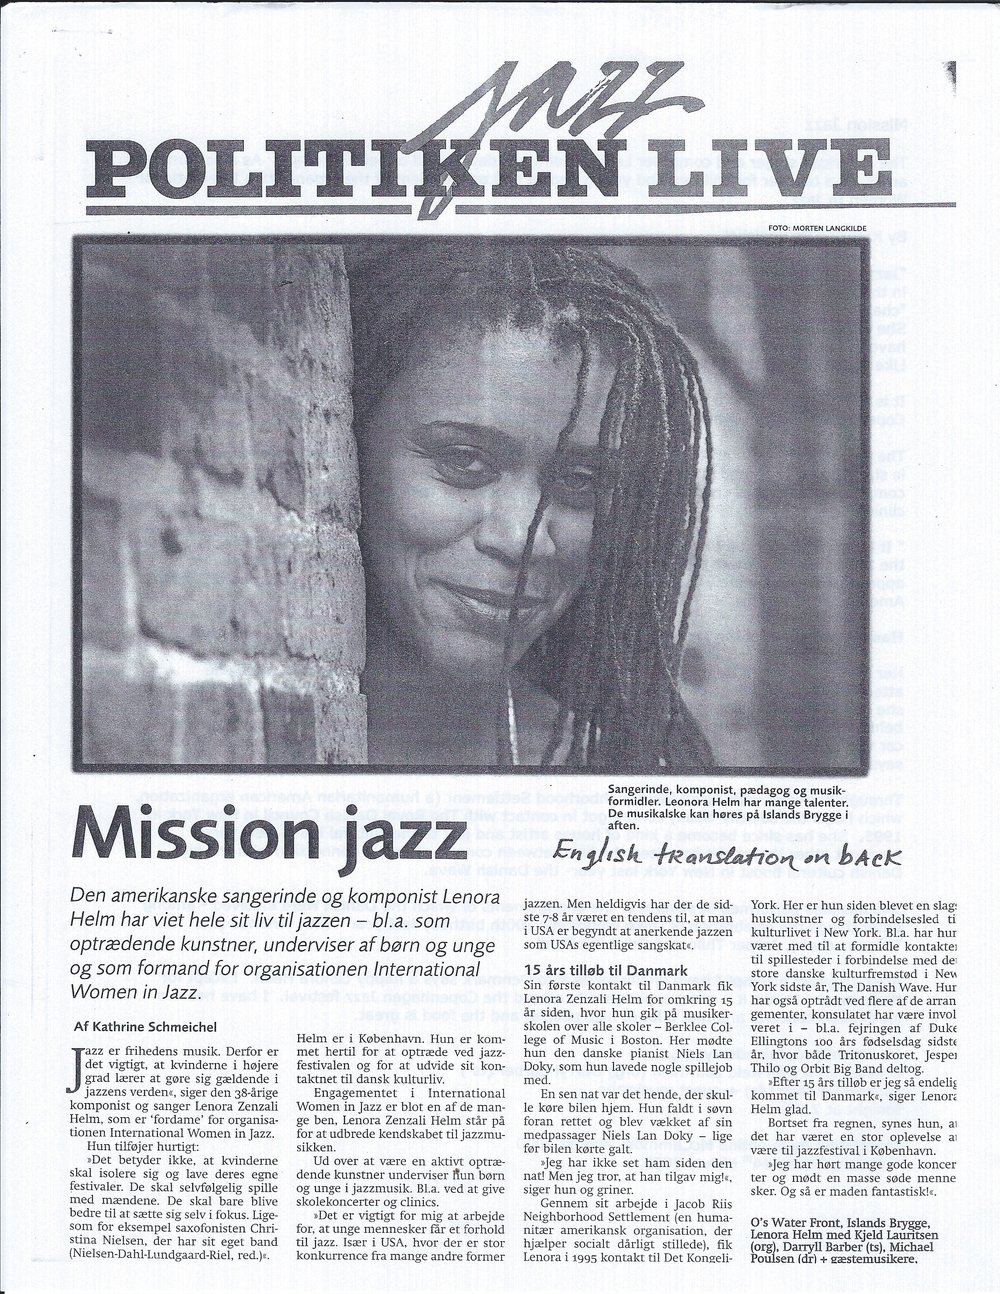 Politiken Live article jpeg copy.jpg